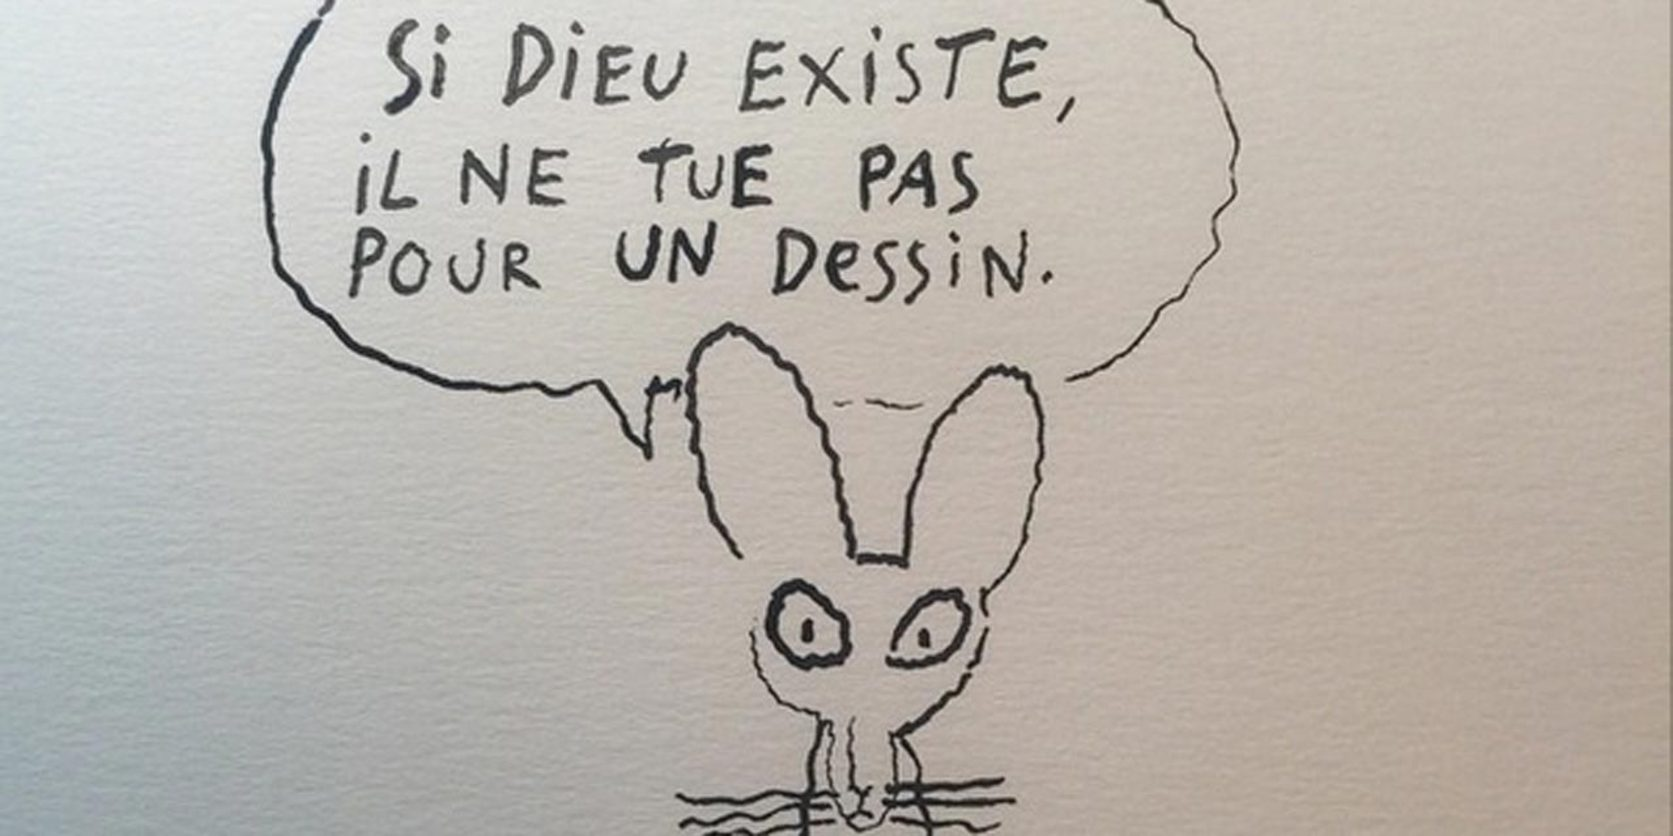 A cartoonist reacts. Joann Sfar/Instagram